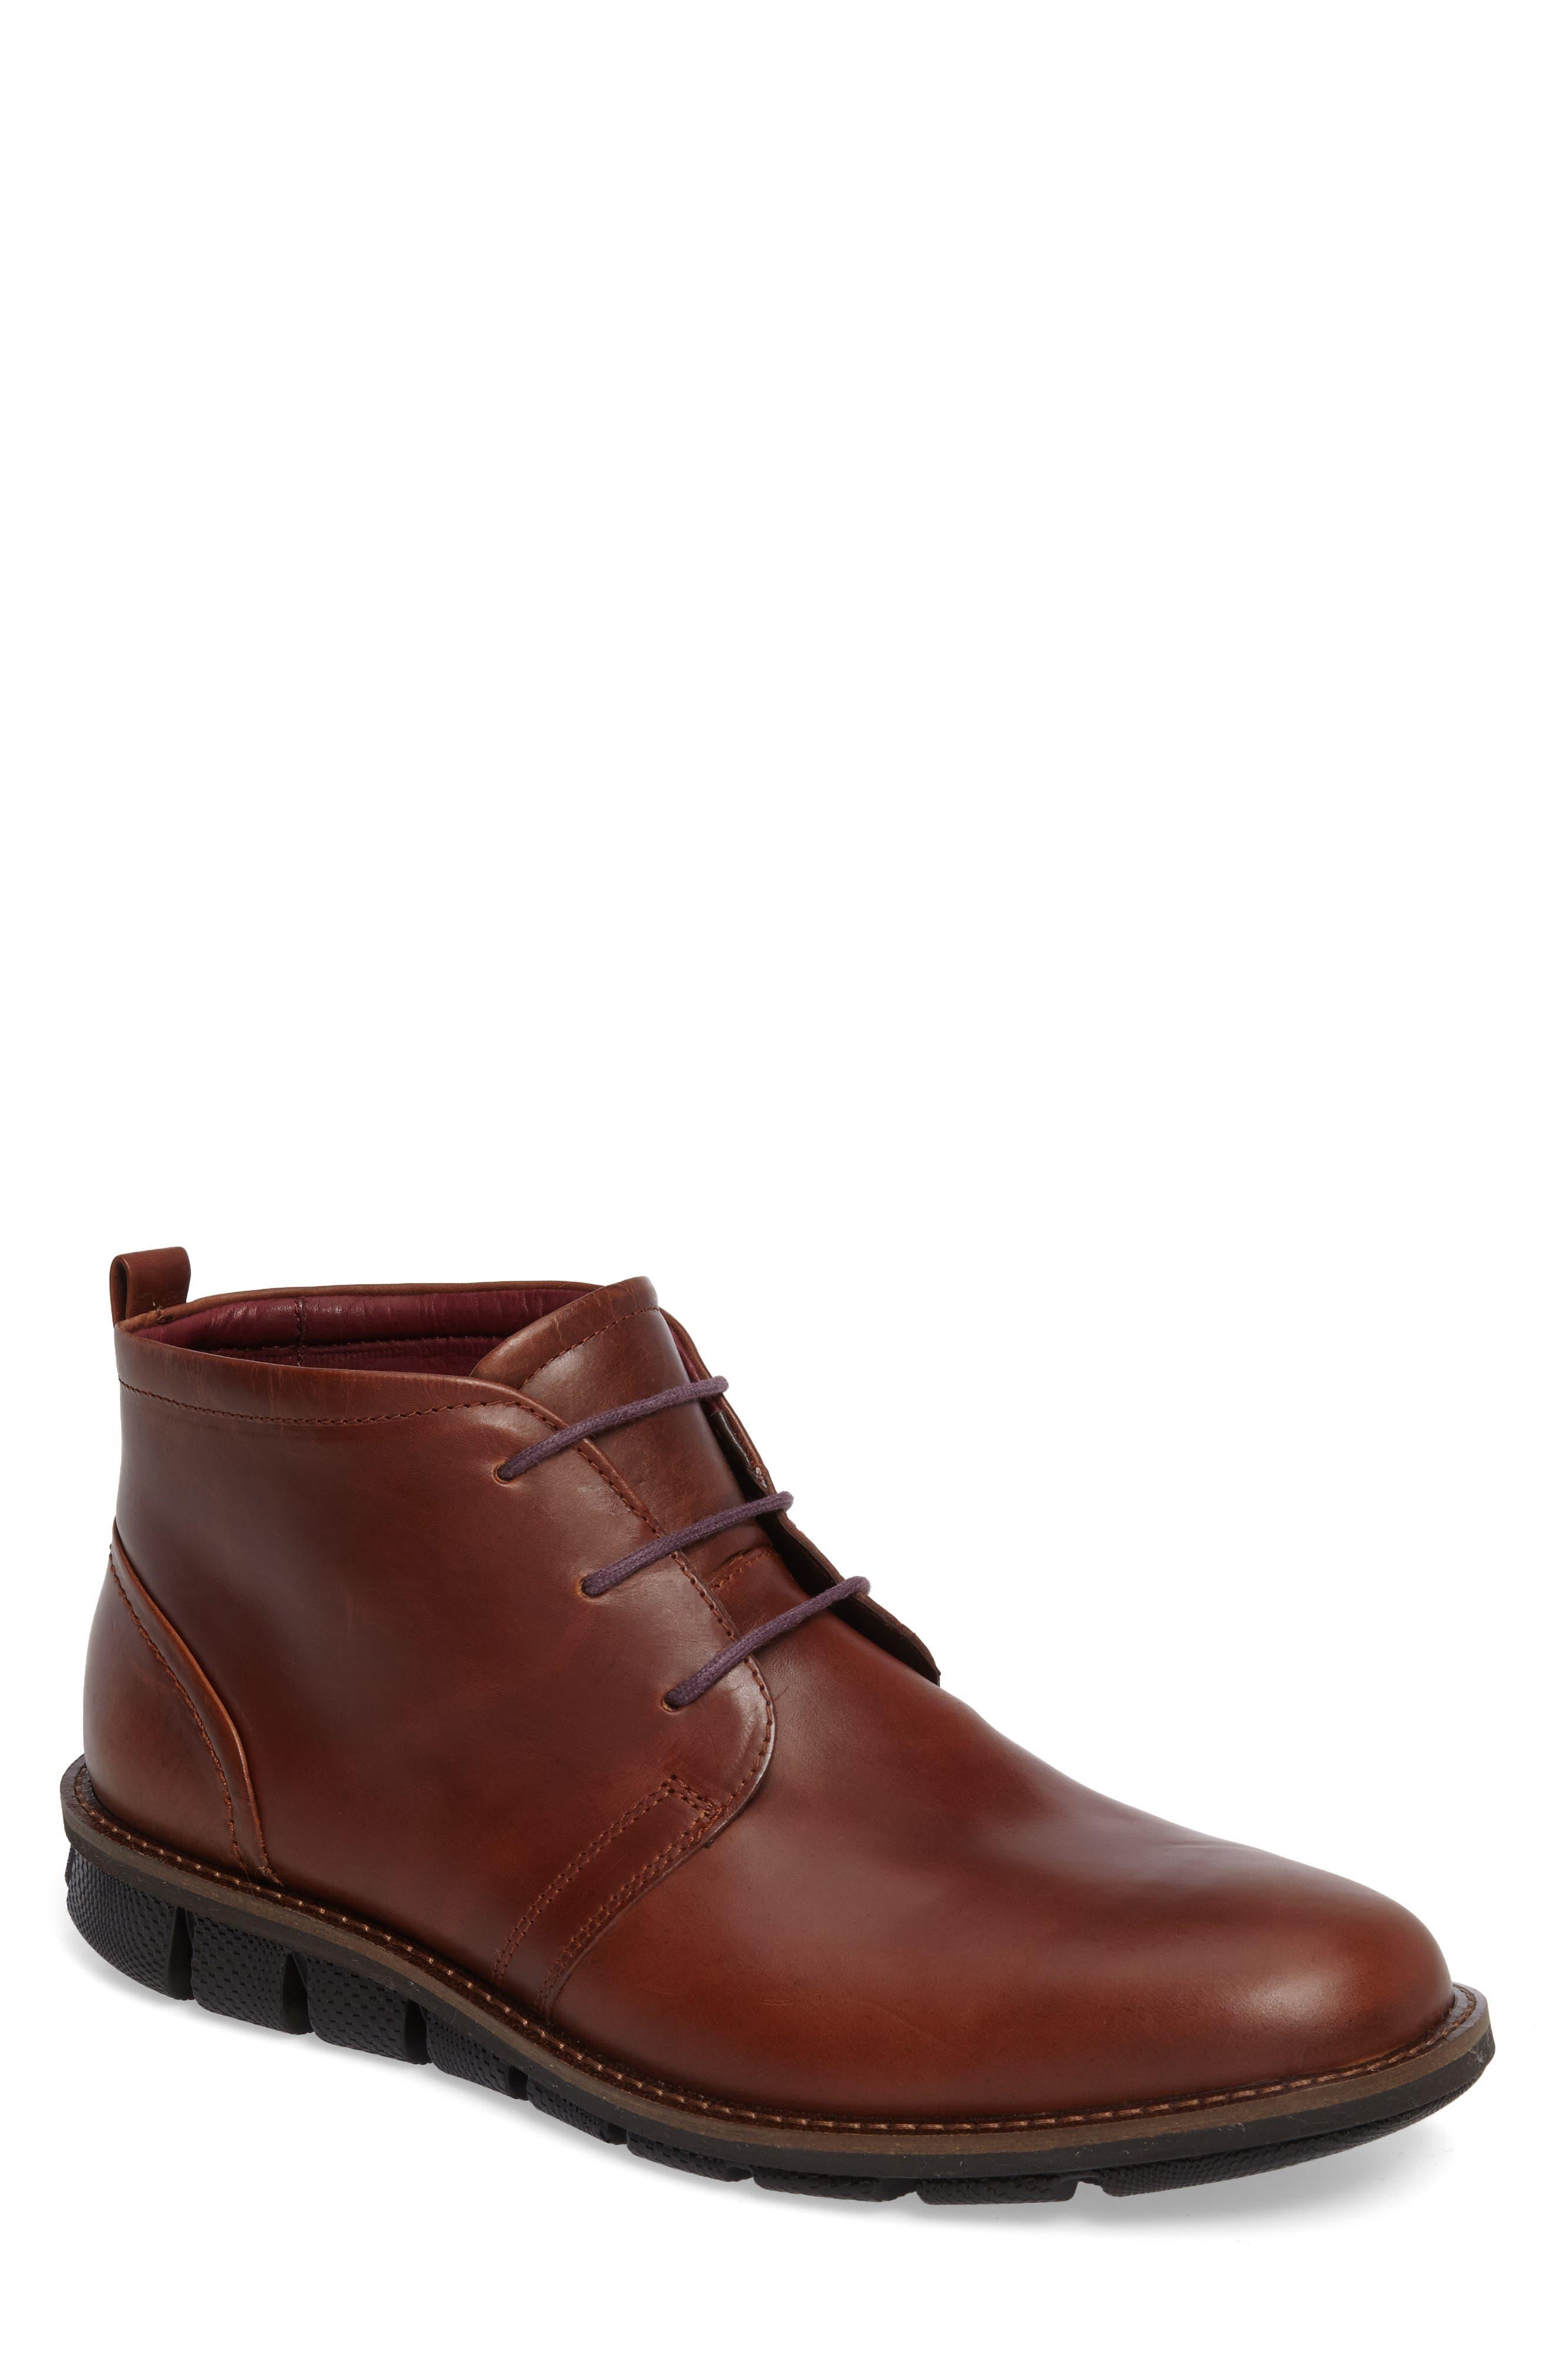 Alternate Image 1 Selected - ECCO 'Jeremy Hybrid' Plain Toe Boot (Men)